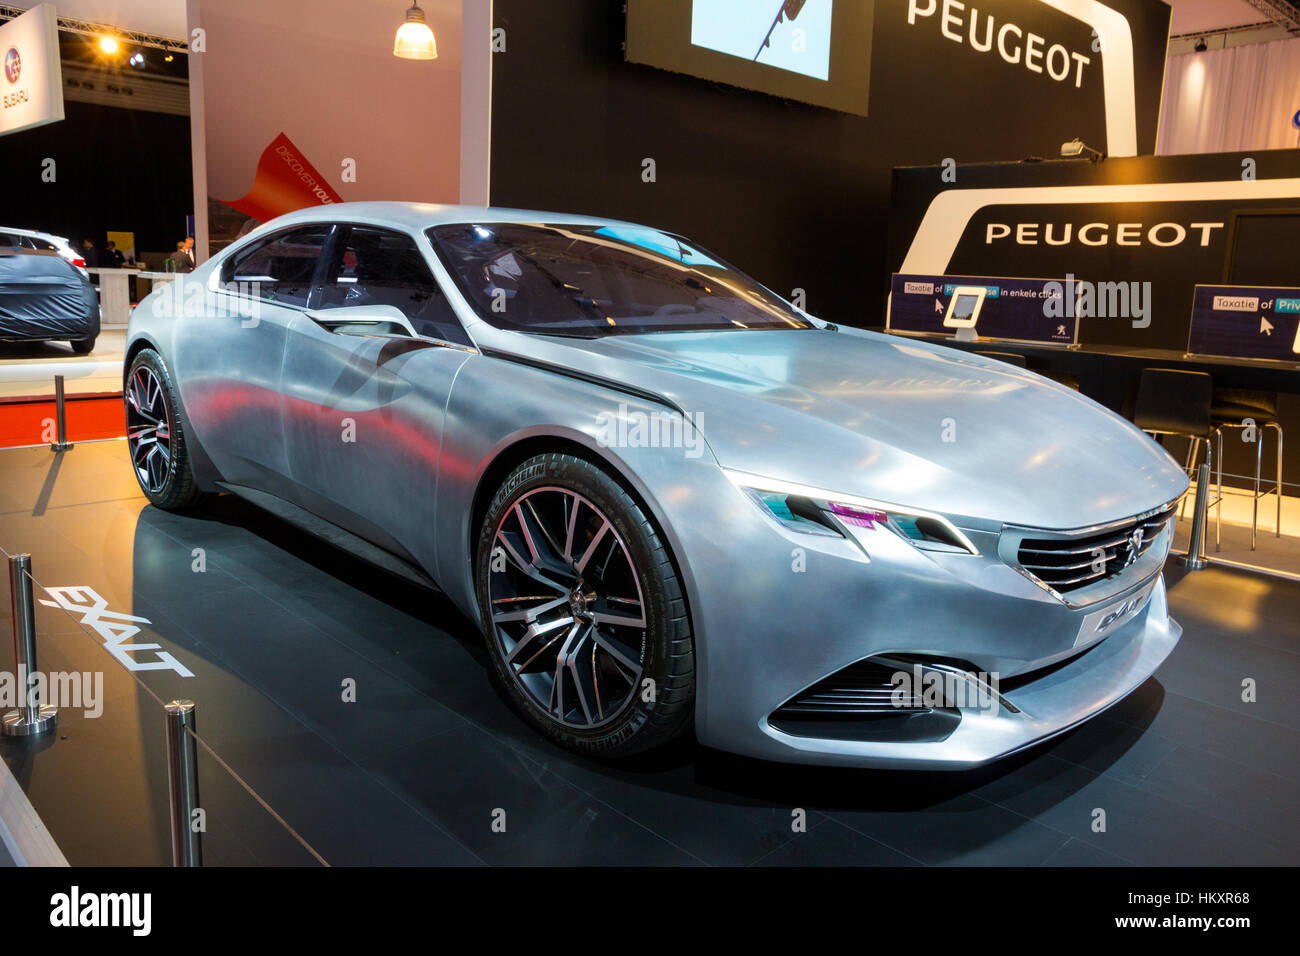 AMSTERDAM - APRIL 16, 2015: Peugeot Exalt concept car at the AutoRAI 2015. - Stock Image